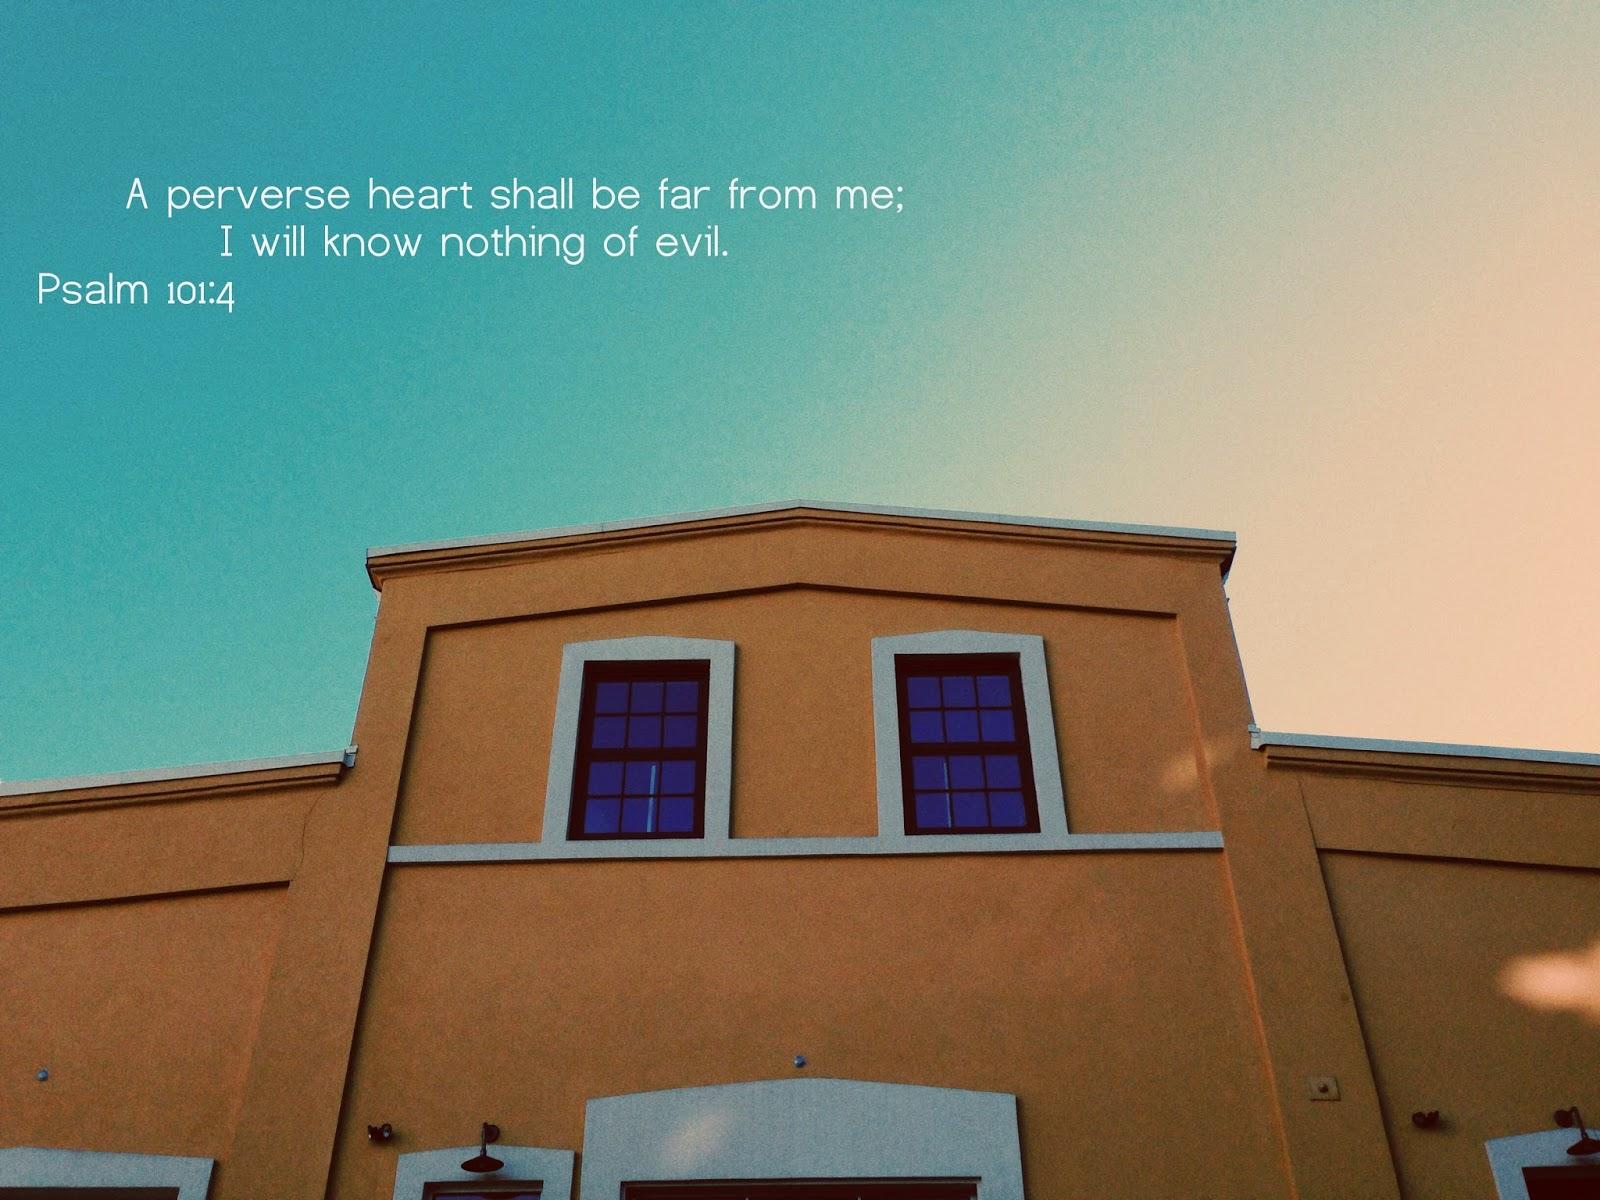 Psalm 101